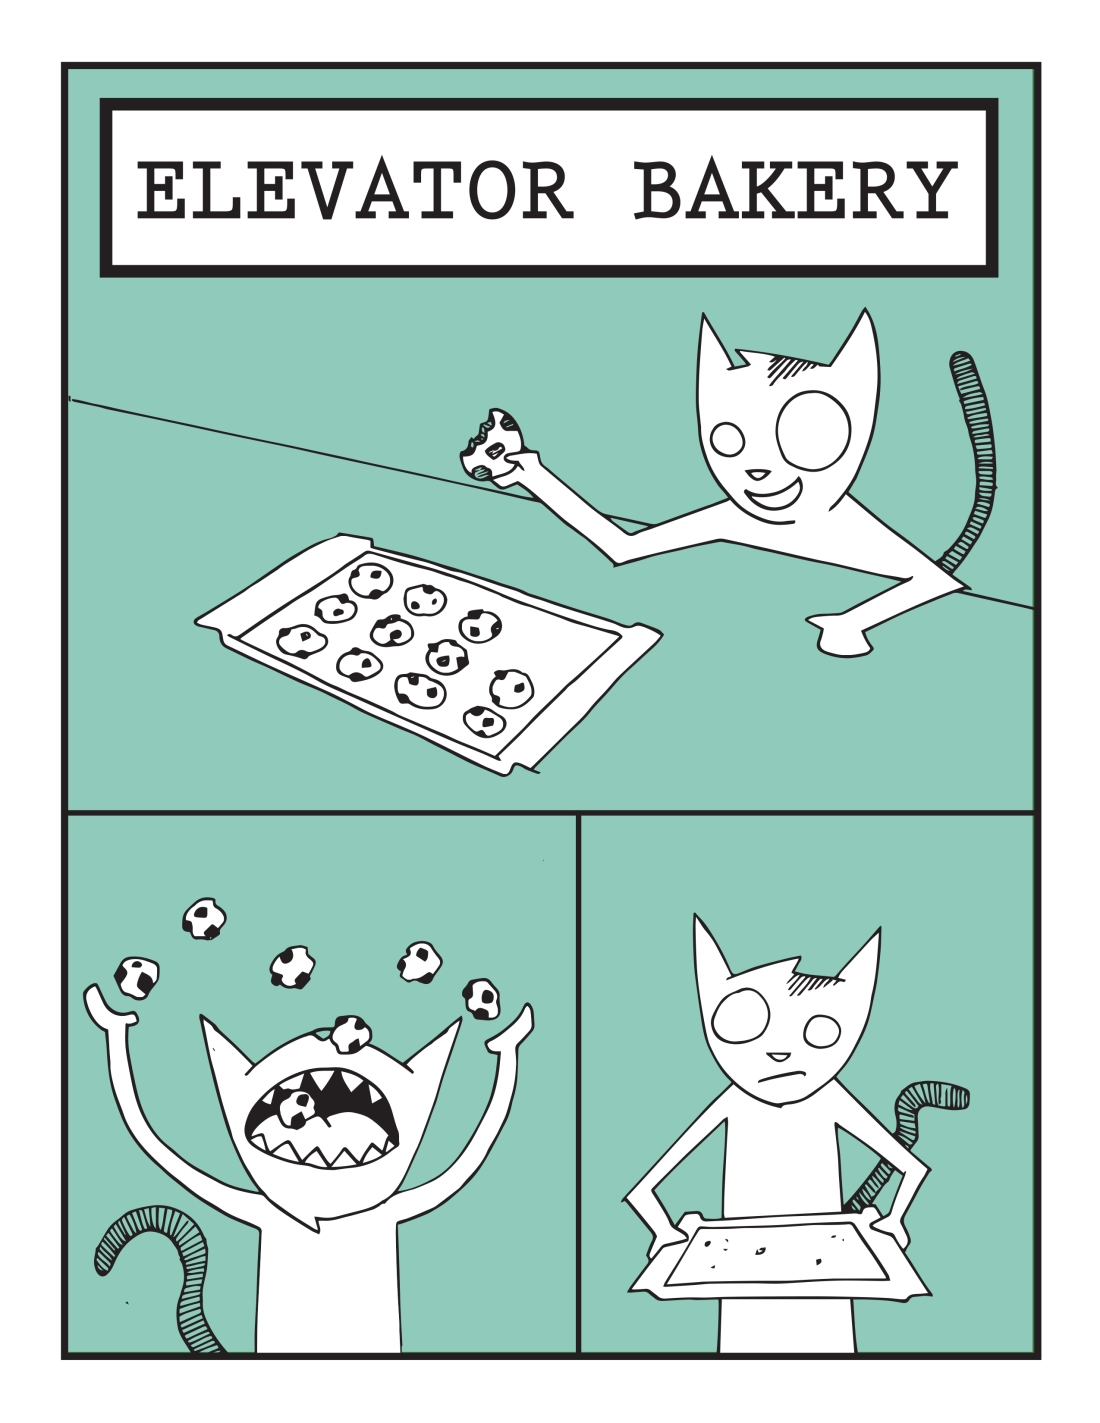 elevator bakery 1